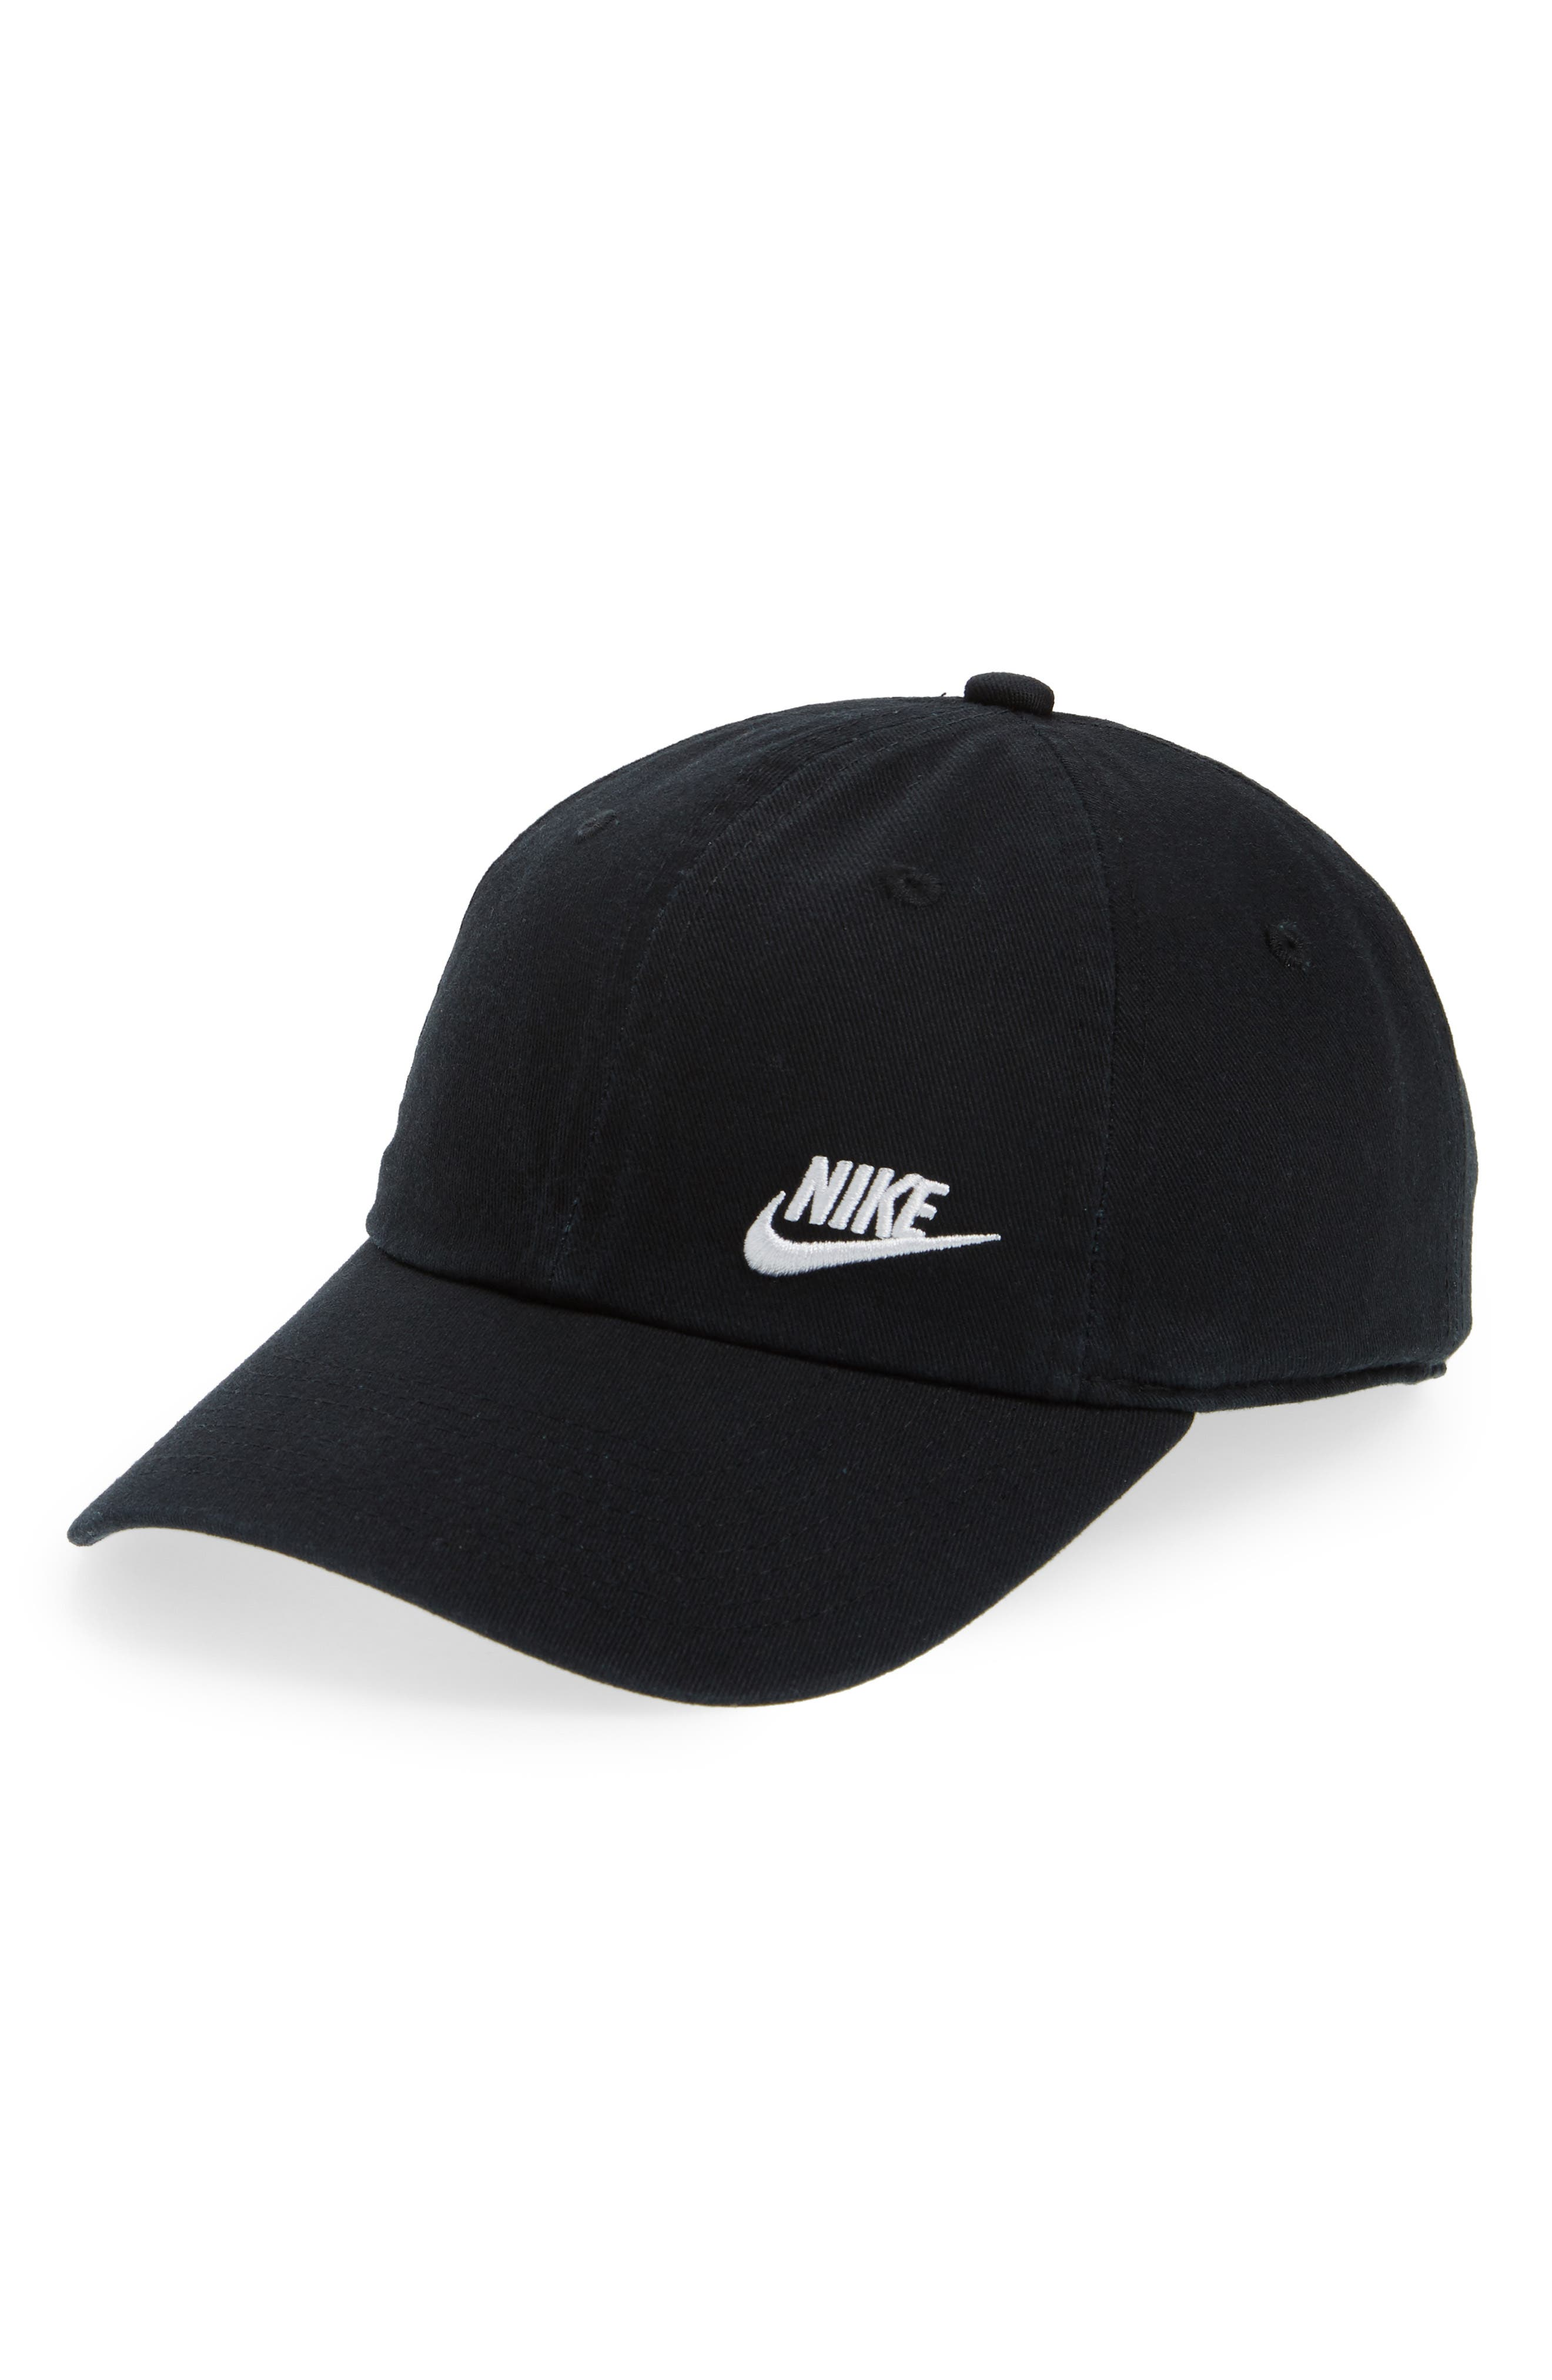 Women's H86 Swoosh Hat,                             Main thumbnail 1, color,                             Black/ White